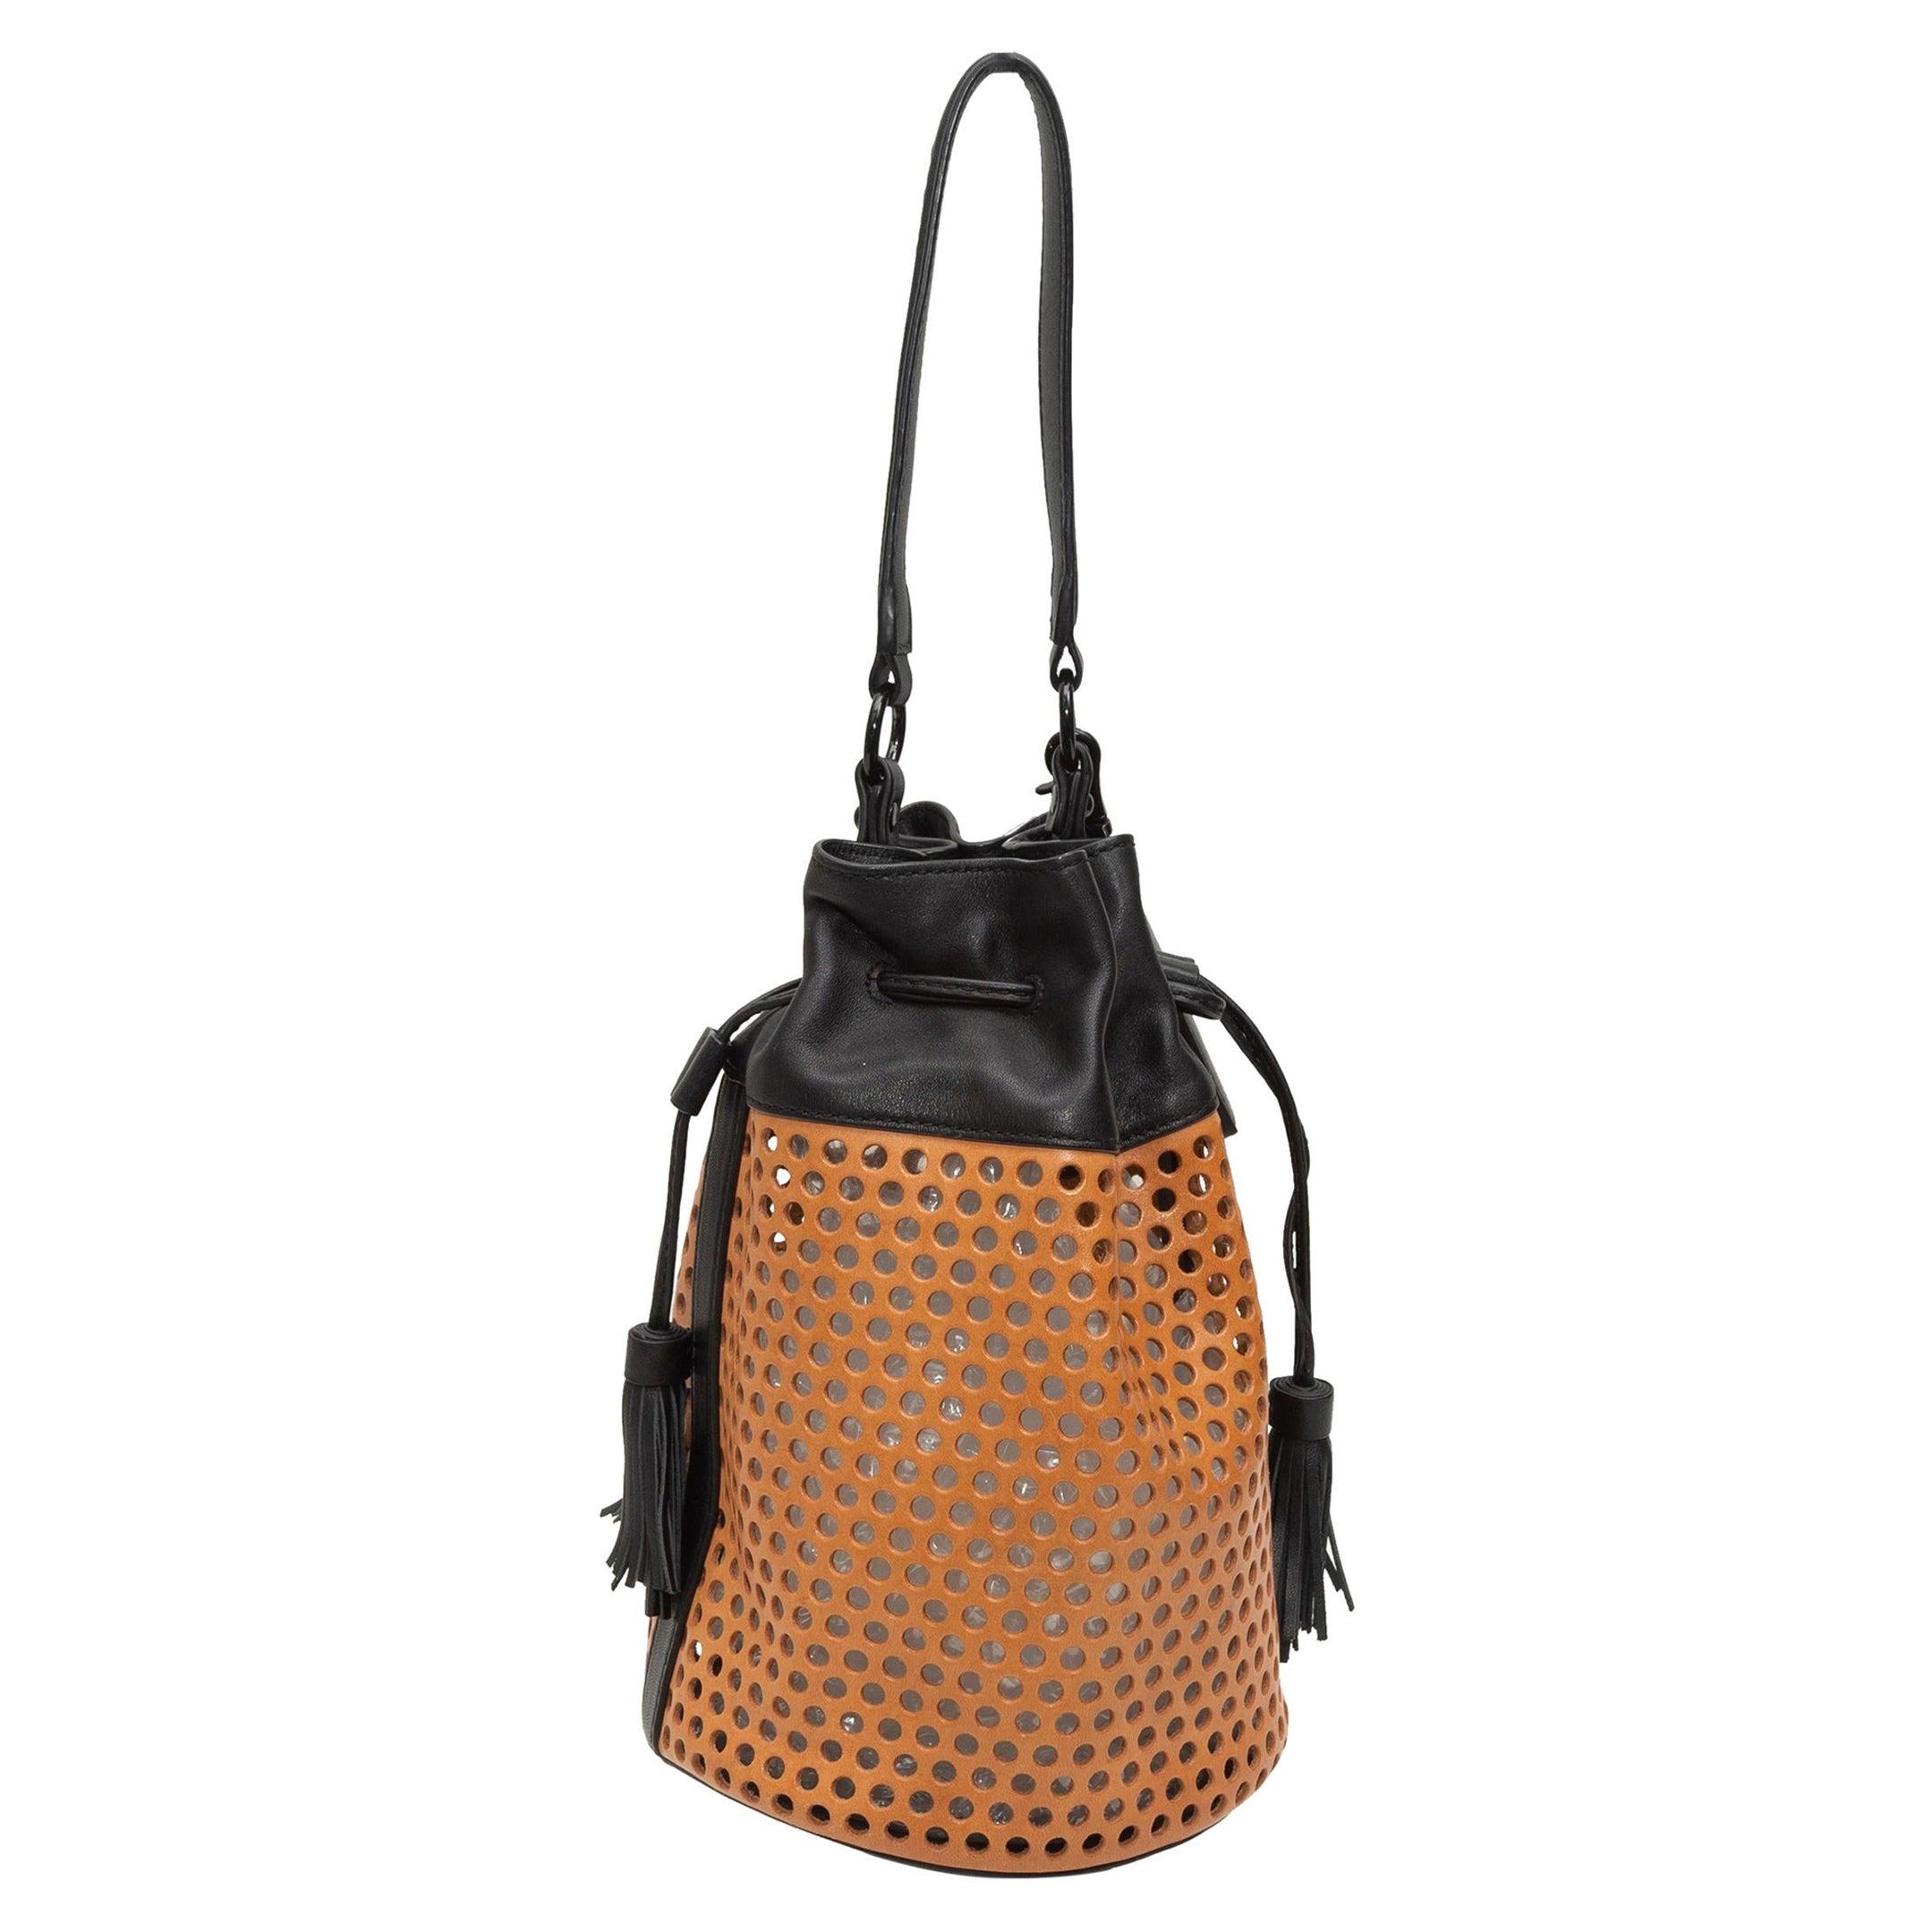 Loeffler Randall Tan & Black Perforated Leather Bucket Bag